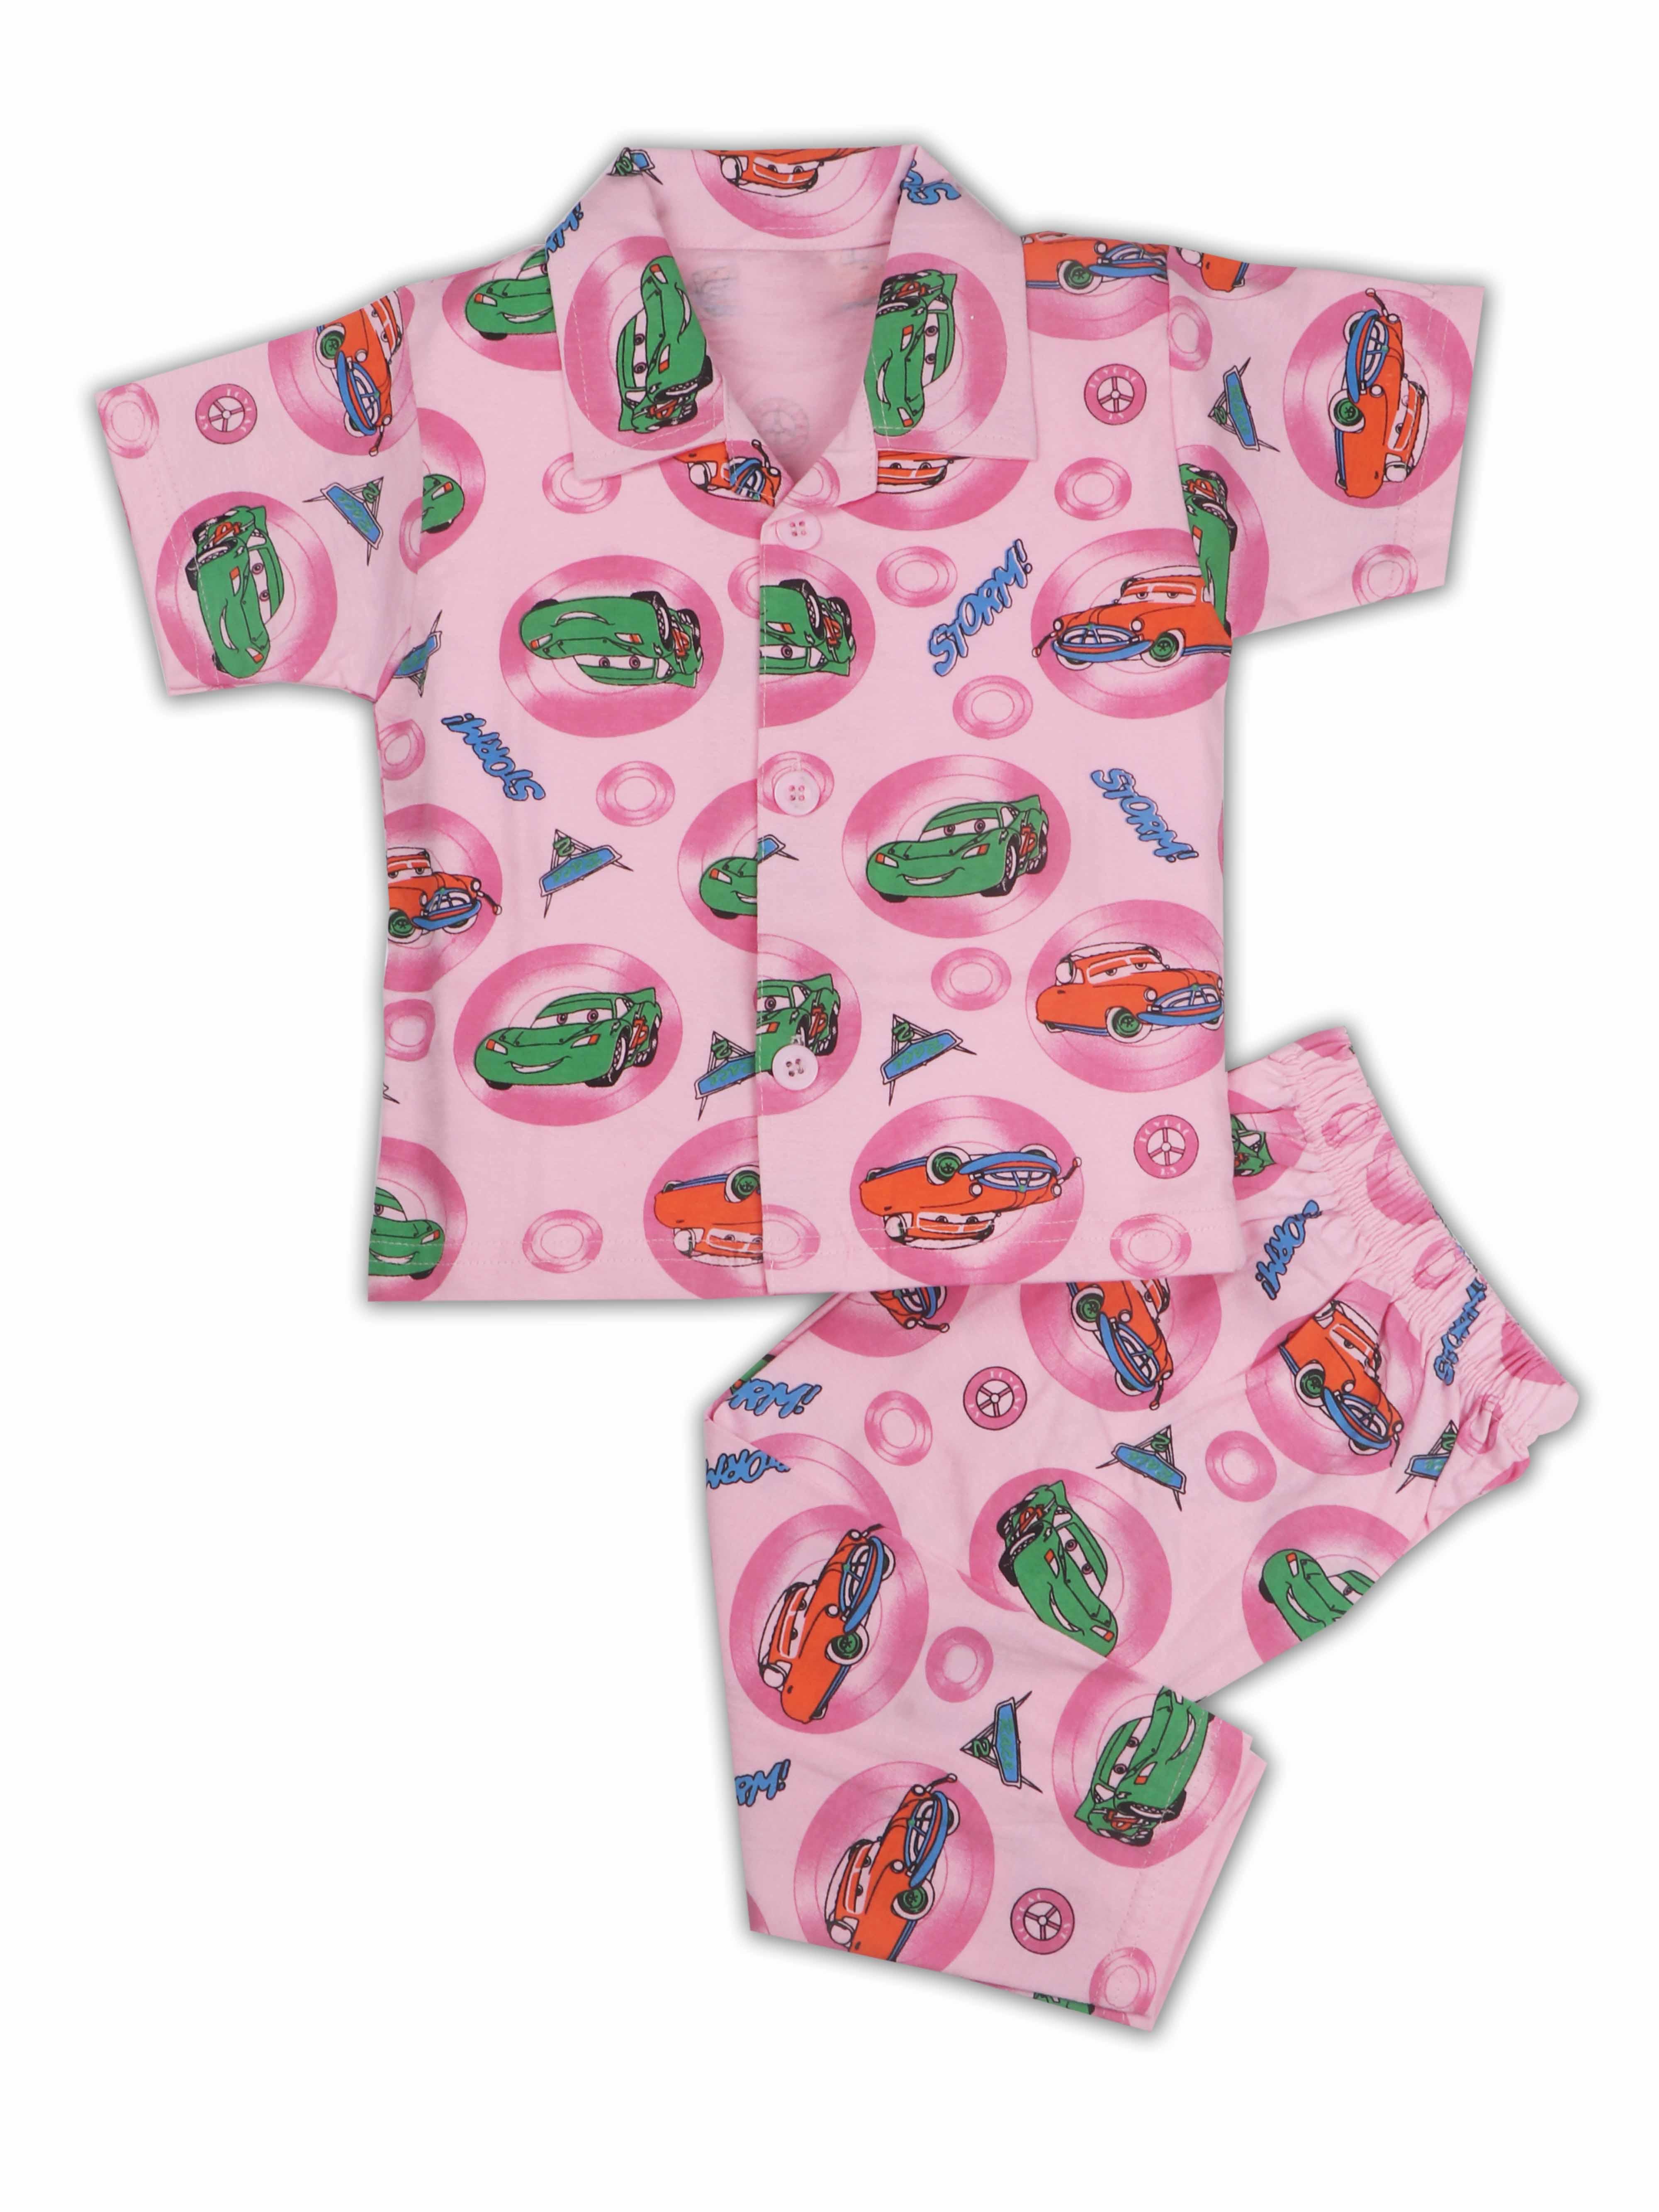 AAAKAR | AAAKAR Full Sleeves Night Suit All Over Print - Pink